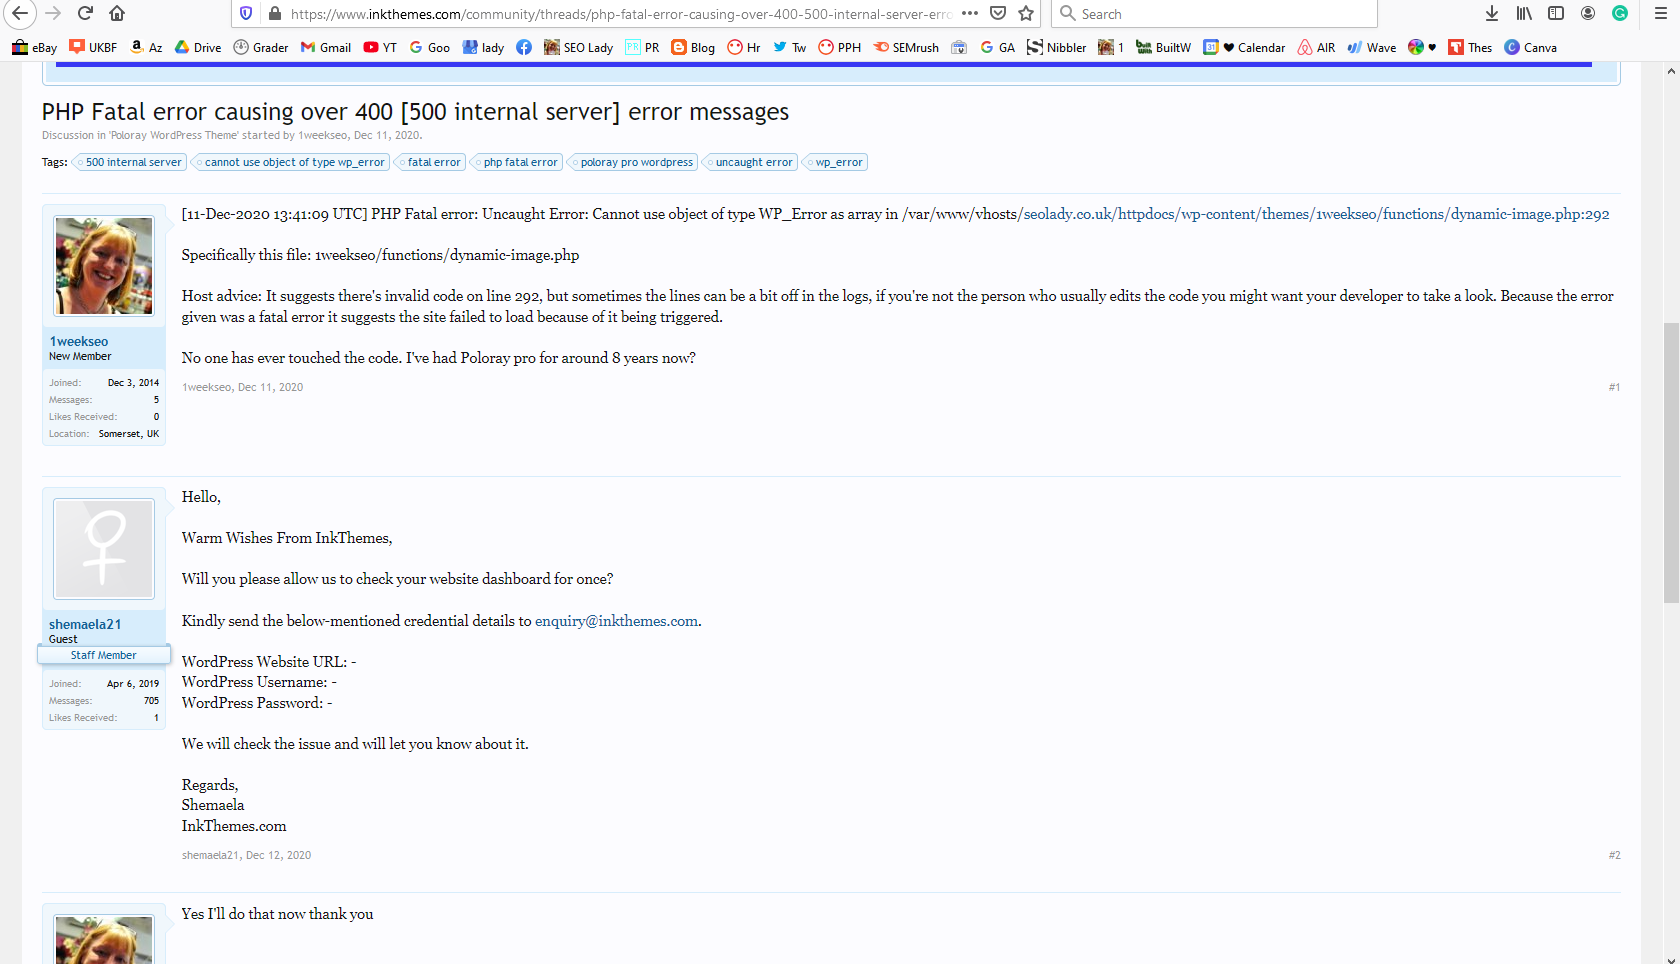 Poloray Theme Wordpress InkThemes Review Bad Customizer Broken Not Working Core Update 2020